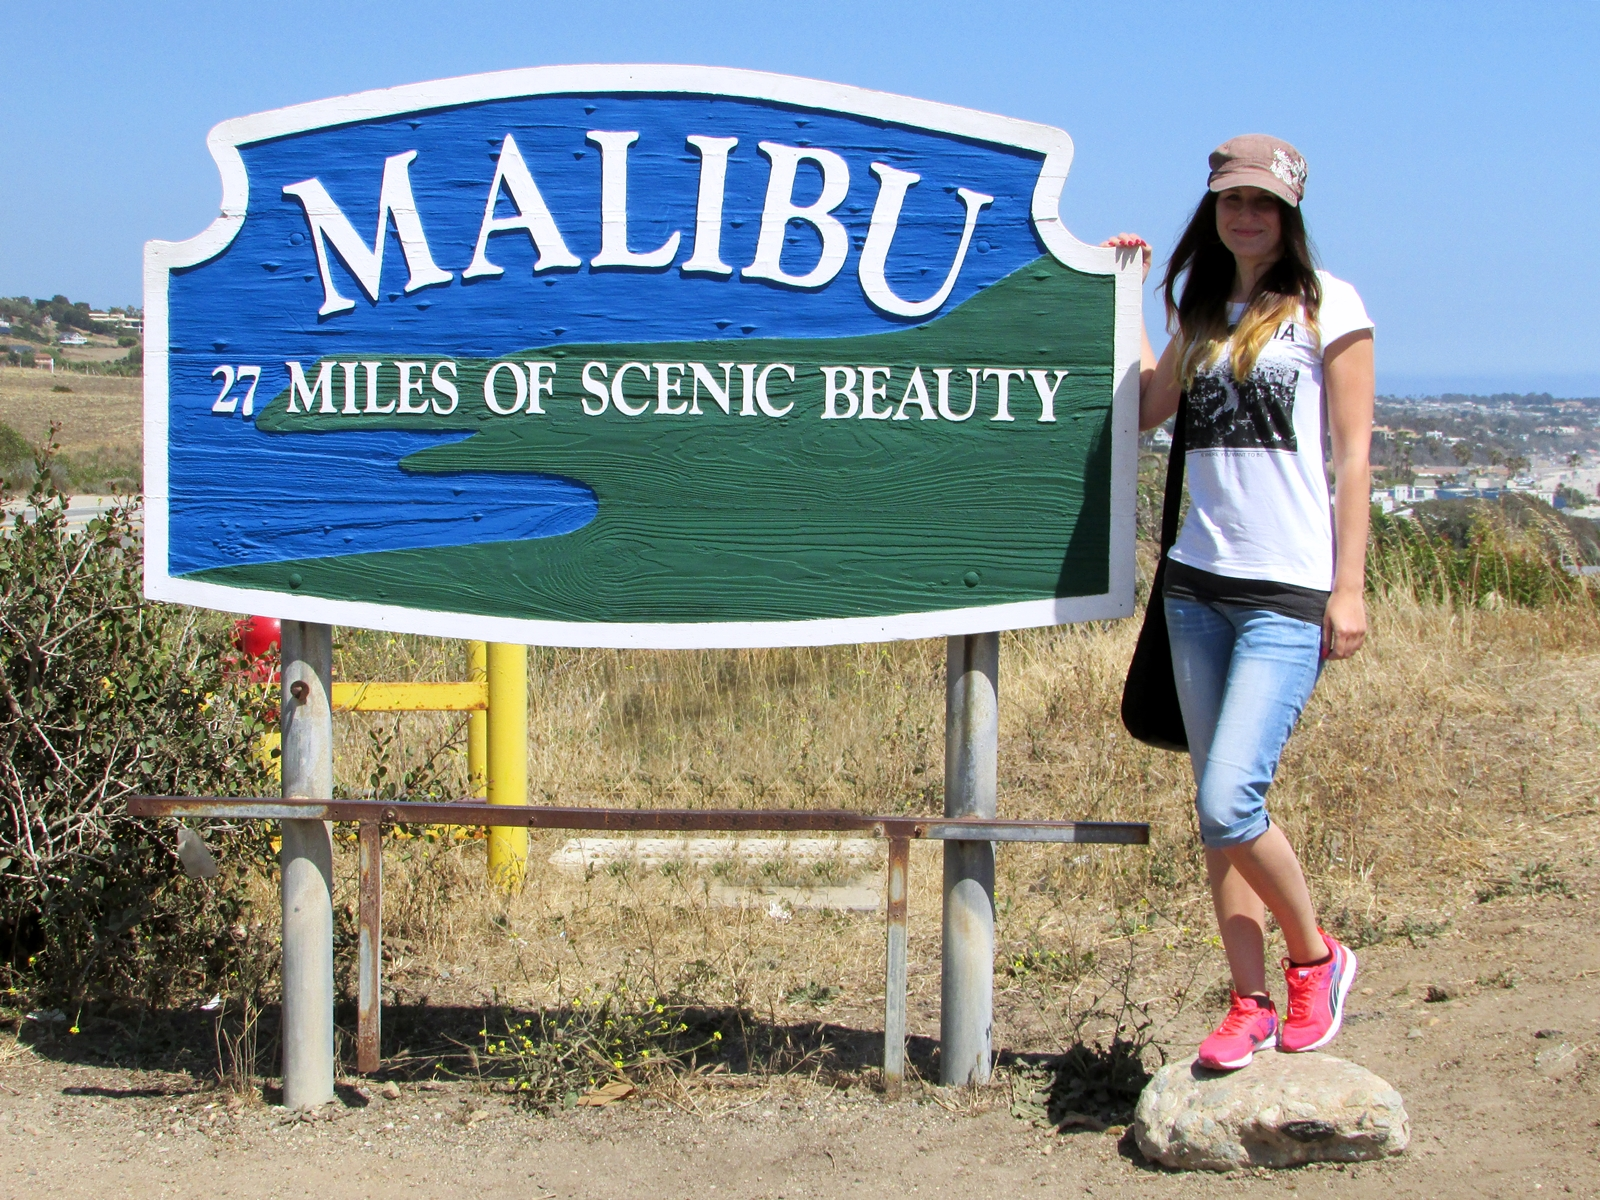 USA Rundreise - Amerika Westküste - Malibu - Fashionladyloves by Tamara Wagner